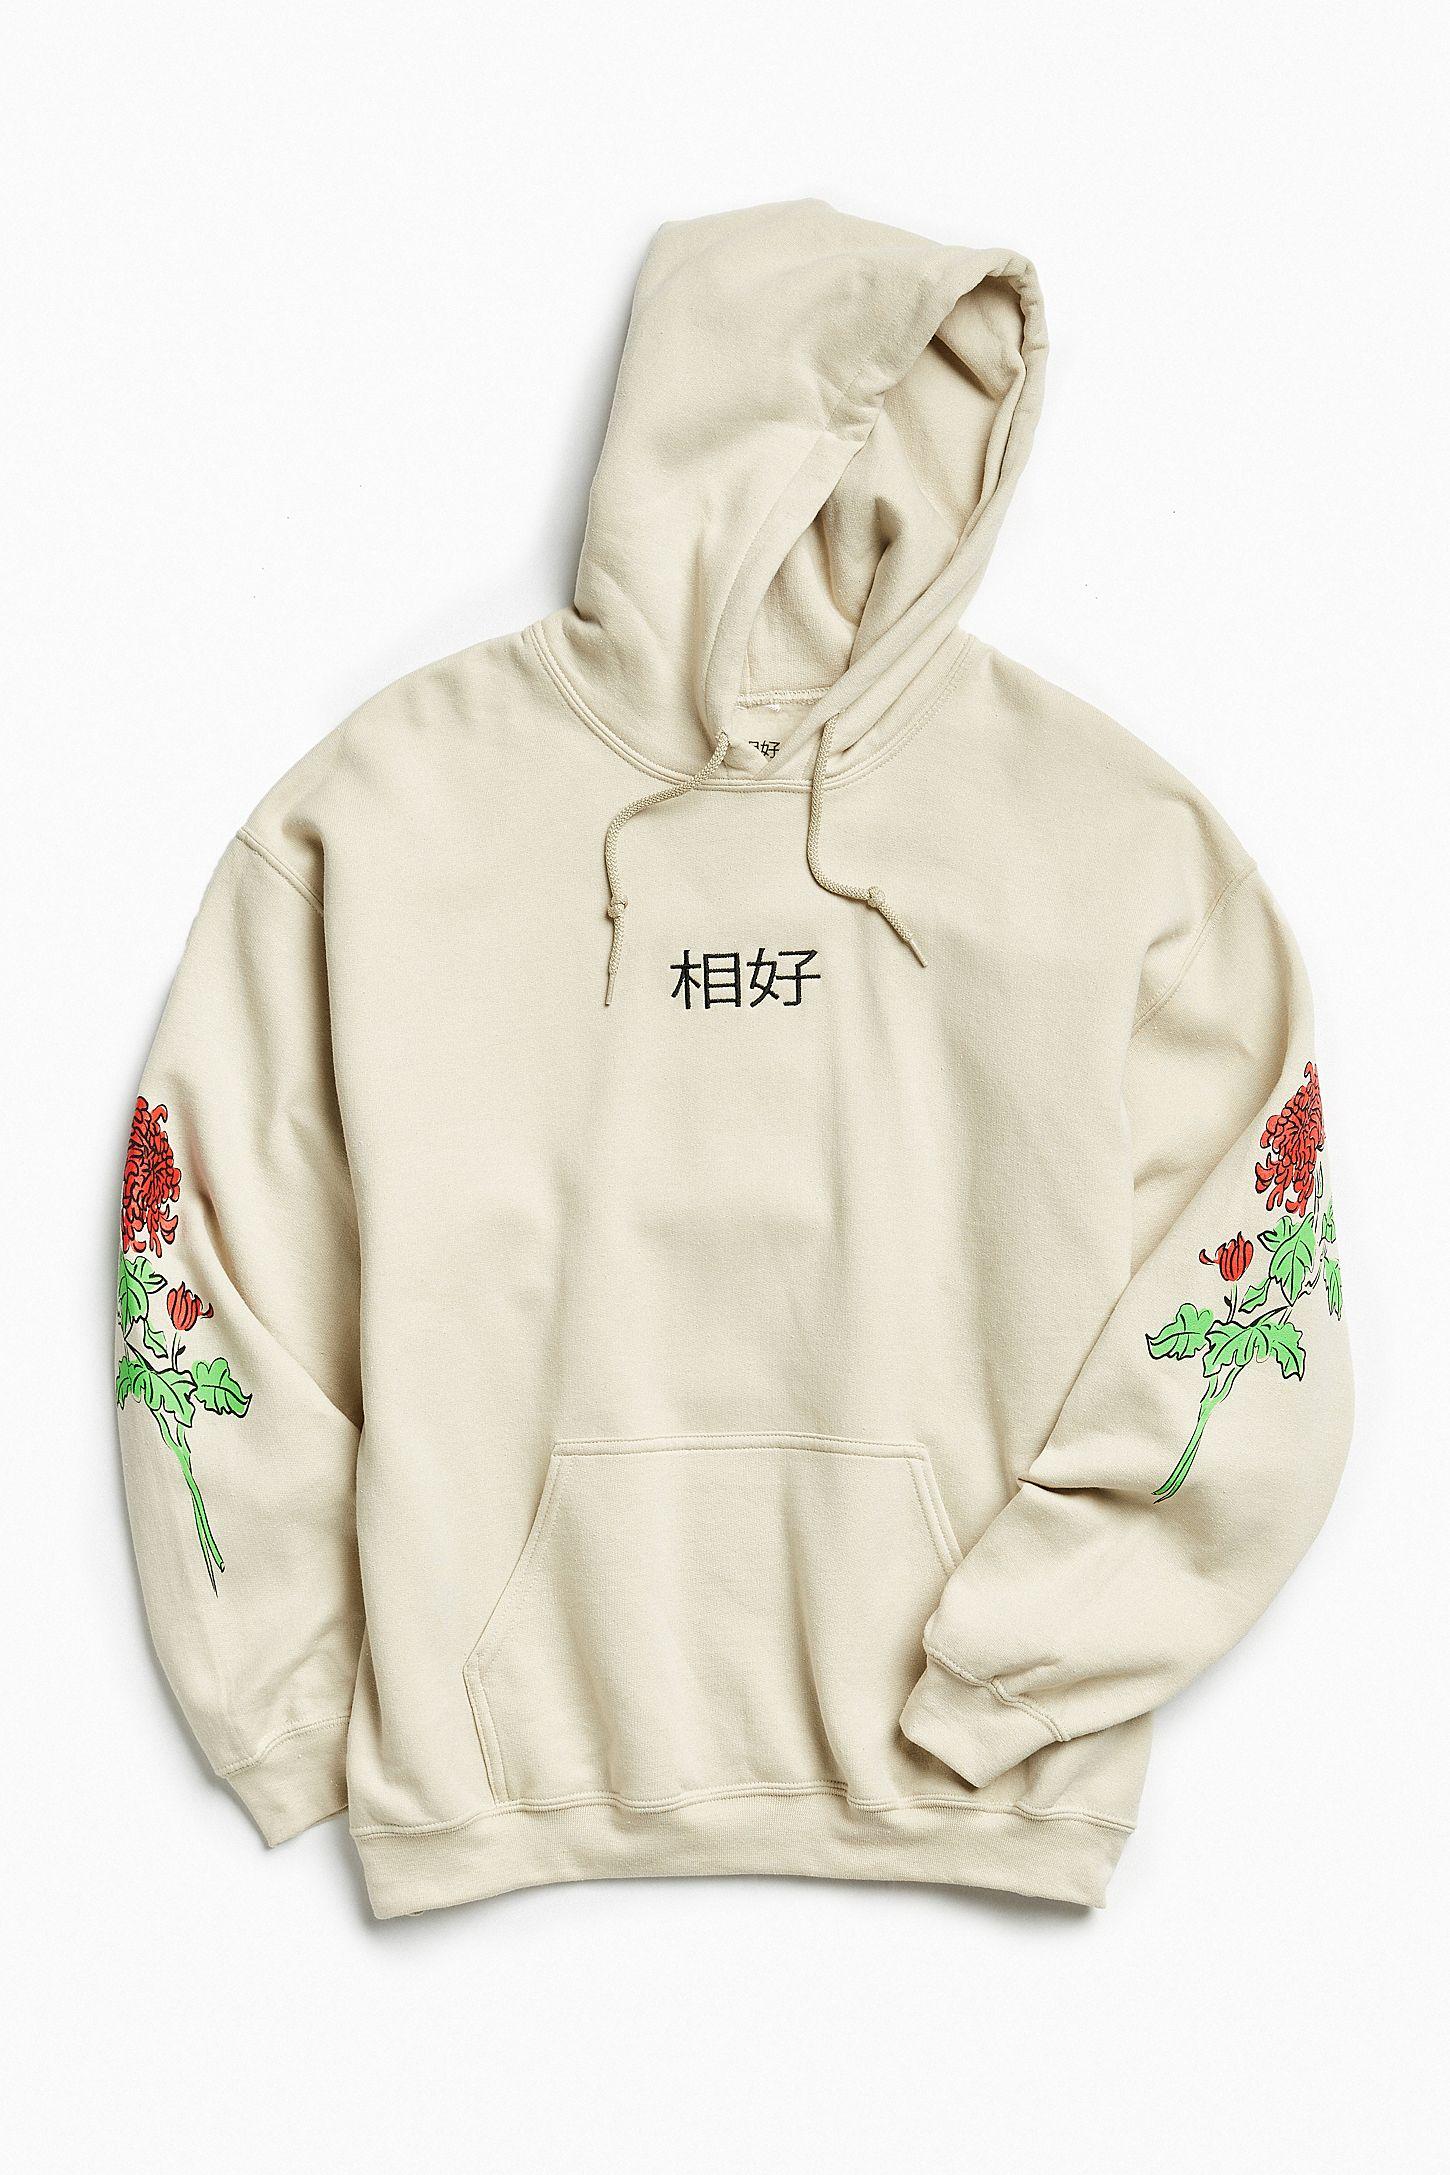 Floral Days Hoodie Sweatshirt Urban Outfitters